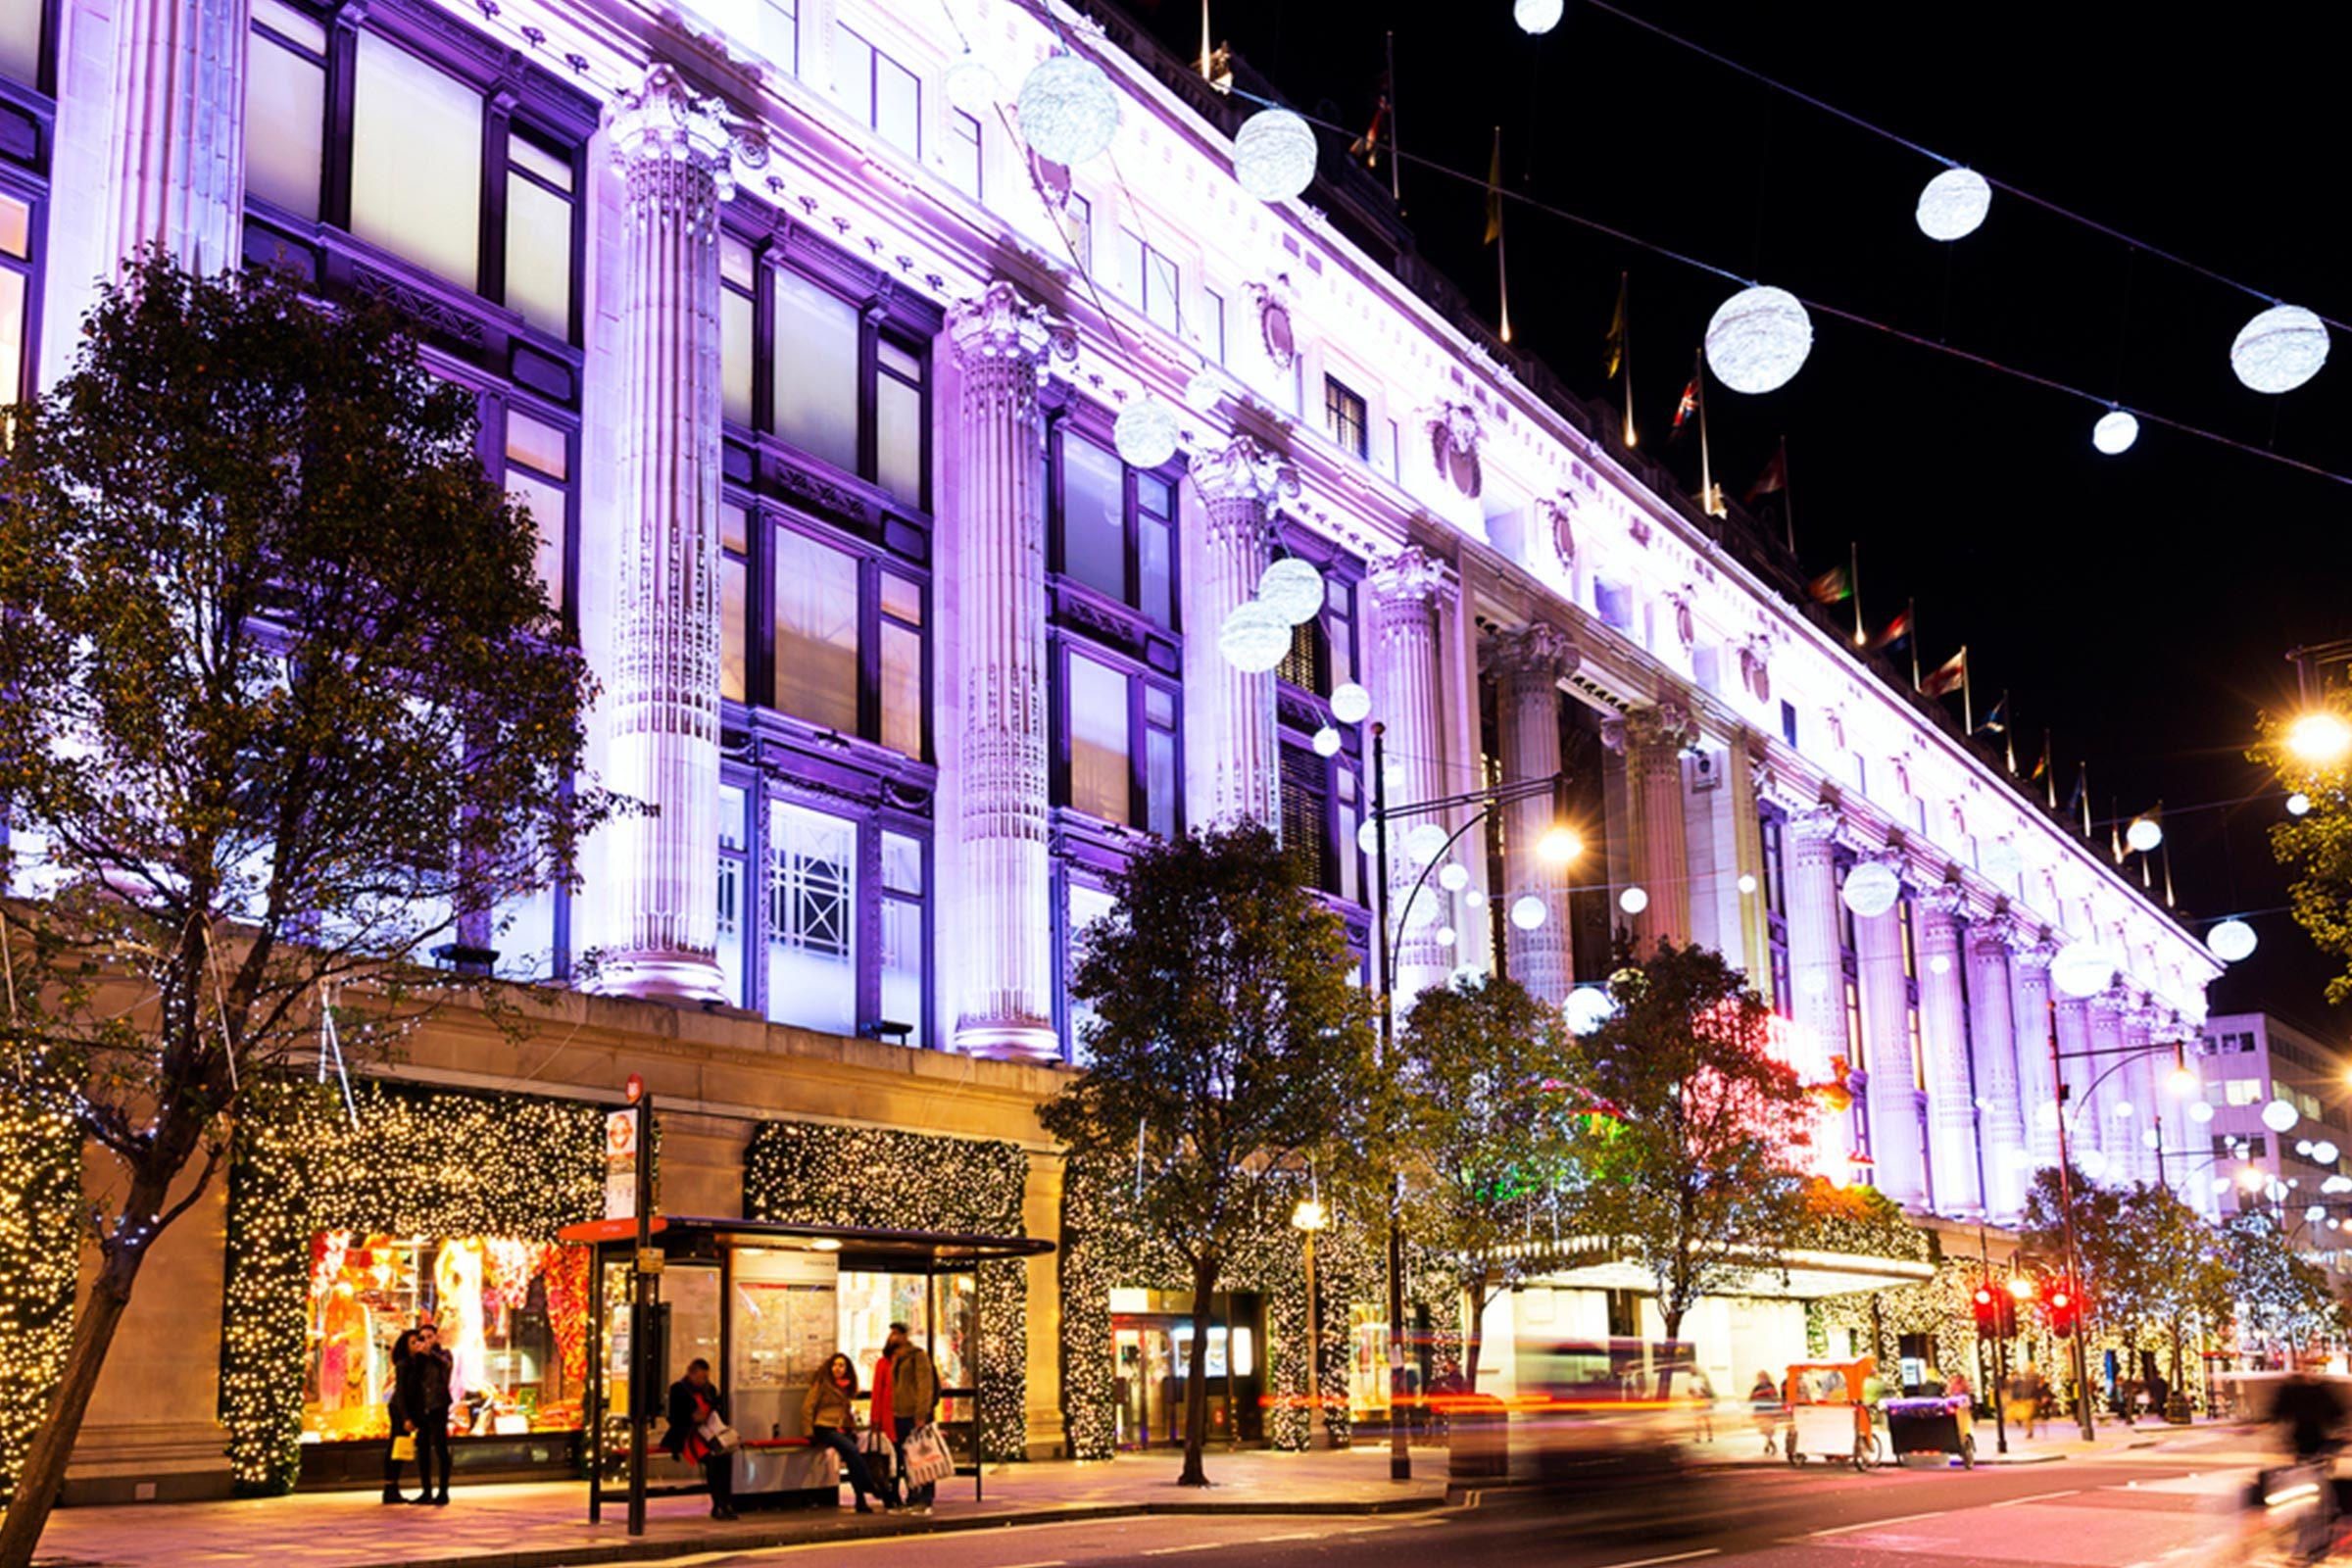 Selfridges department store London